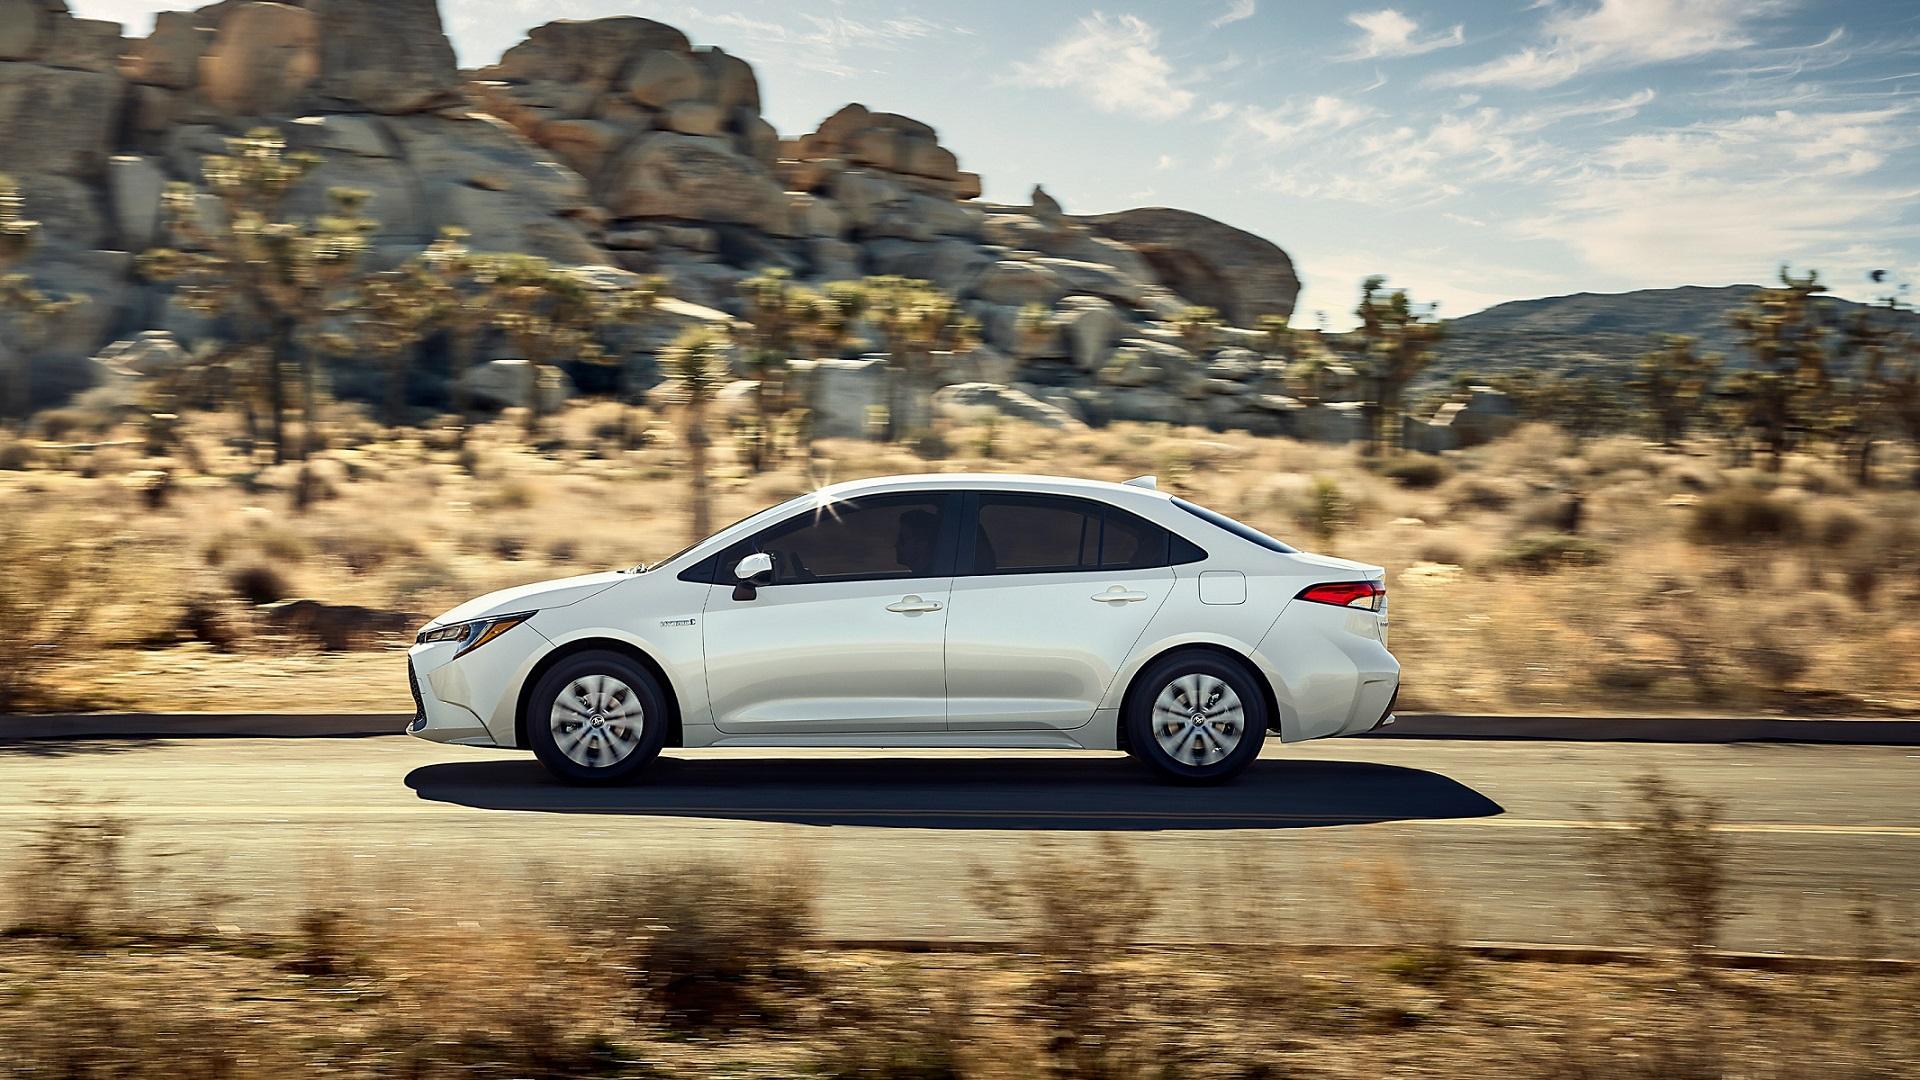 2020 Toyota Corolla Hybrid vs 2019 Hyundai Ioniq Hybrid in Kansas City, MO, 64114